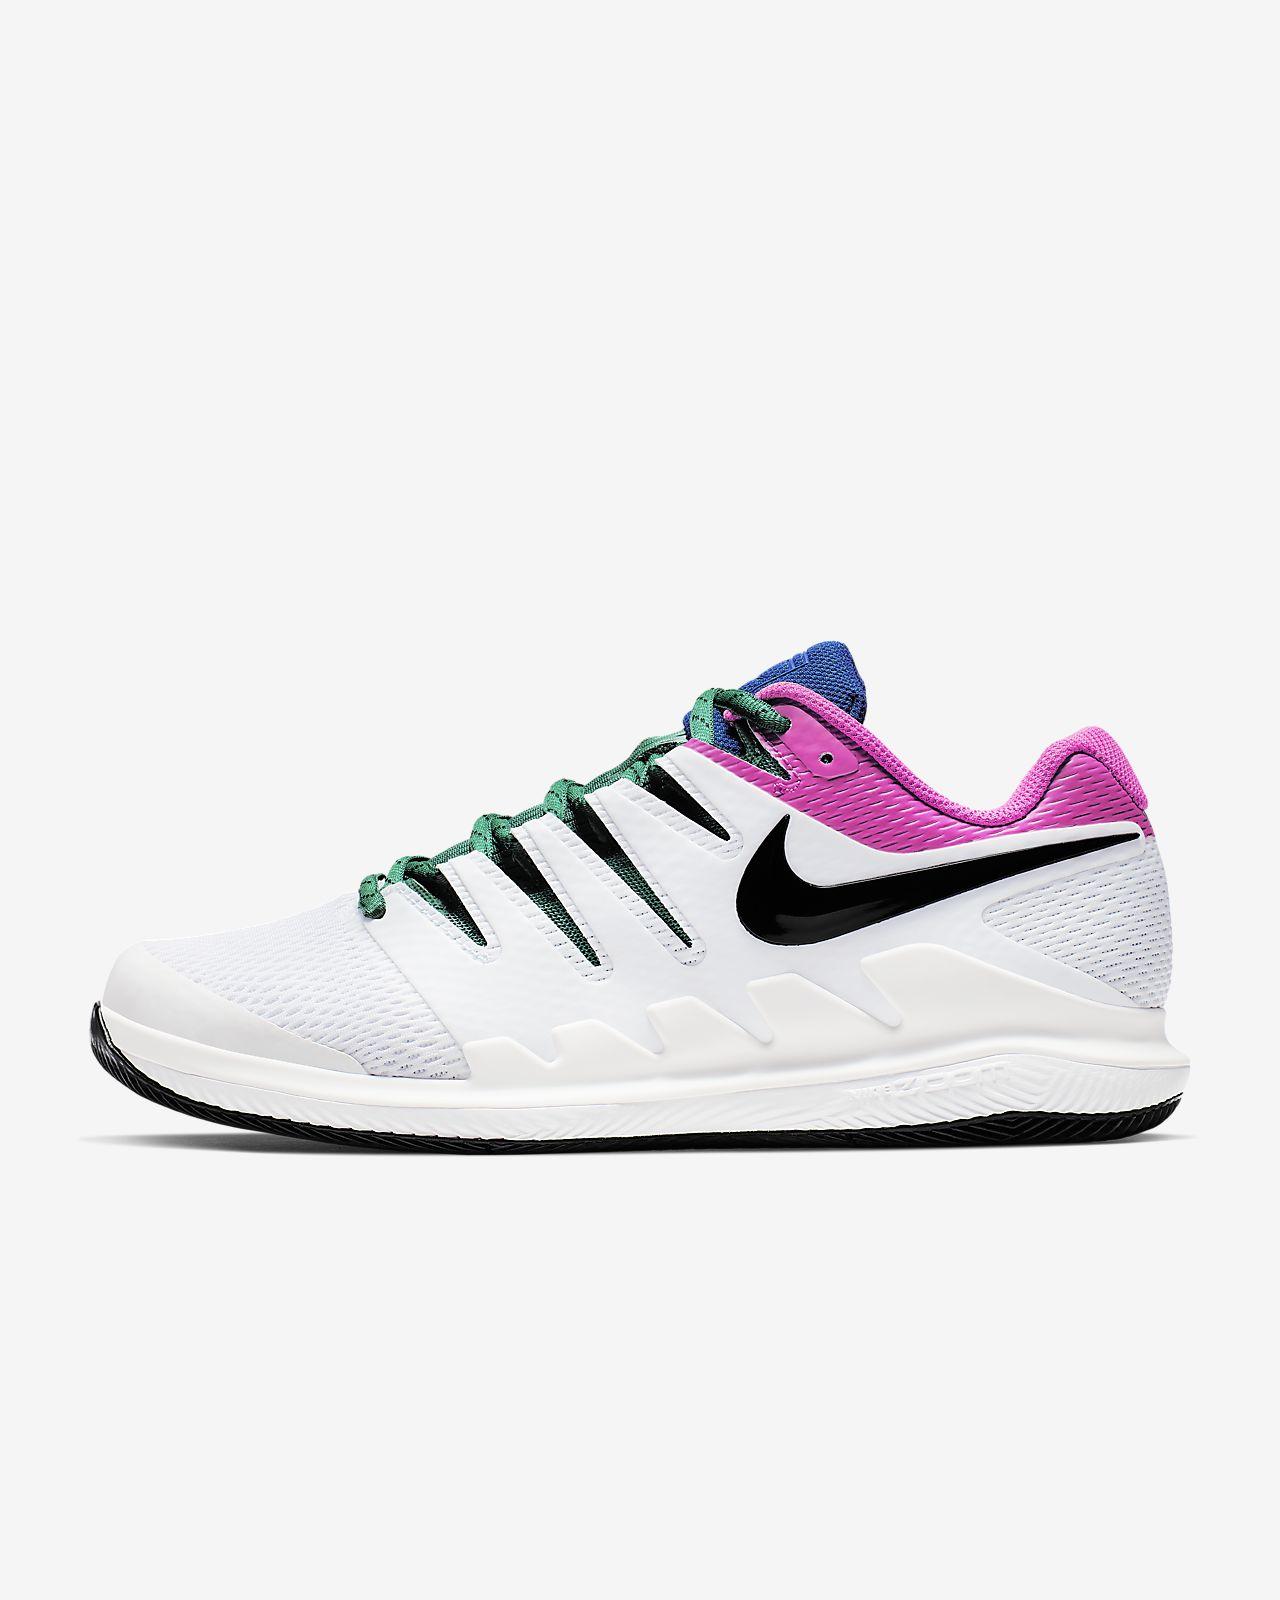 81d139bf41b NikeCourt Air Zoom Vapor X Men s Hard Court Tennis Shoe. Nike.com DK